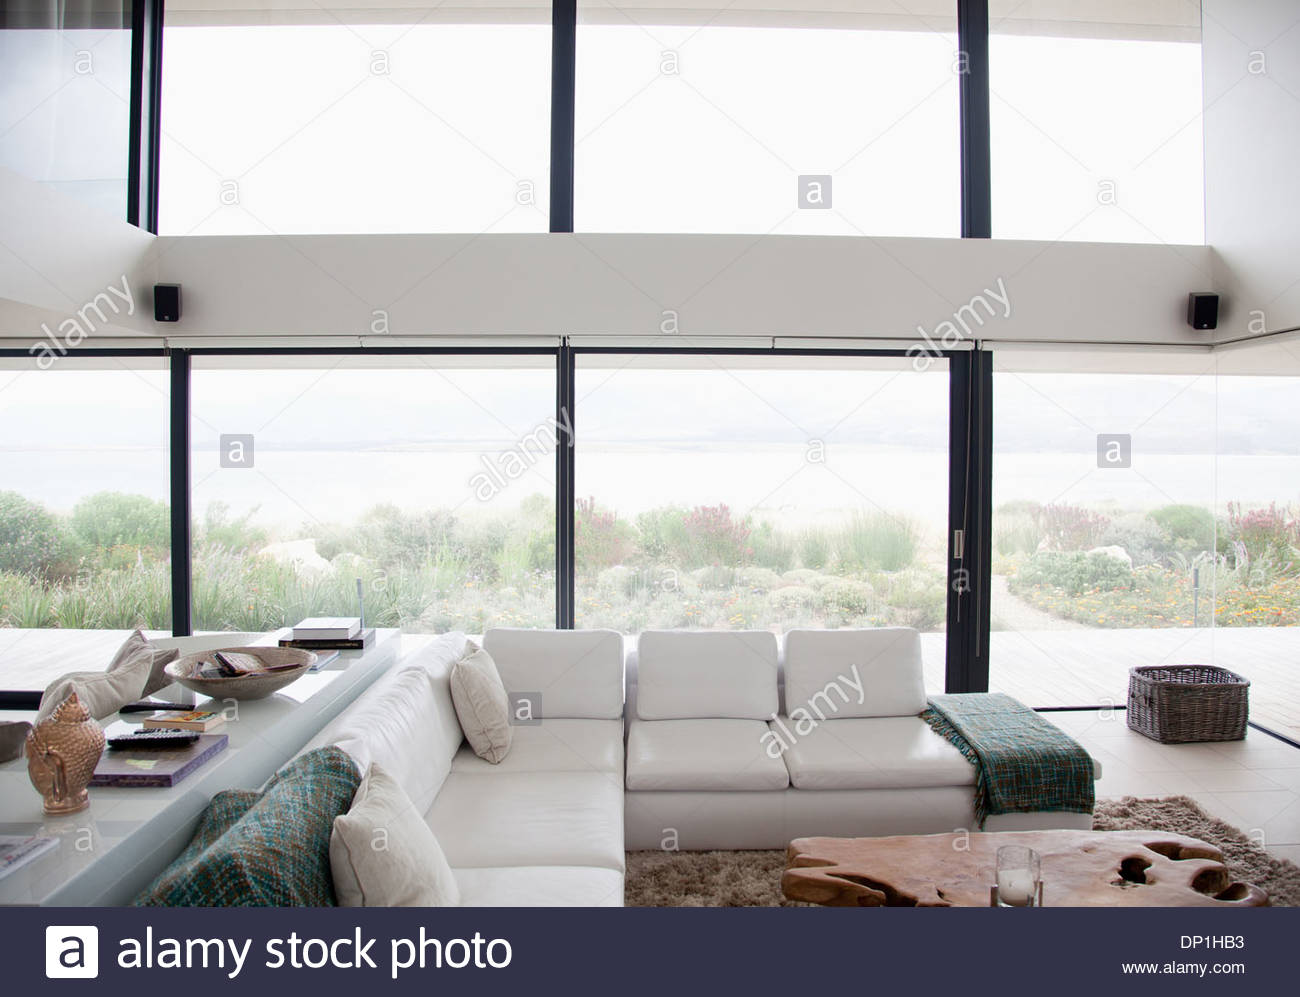 Portrait de canapé-in modern living room Photo Stock